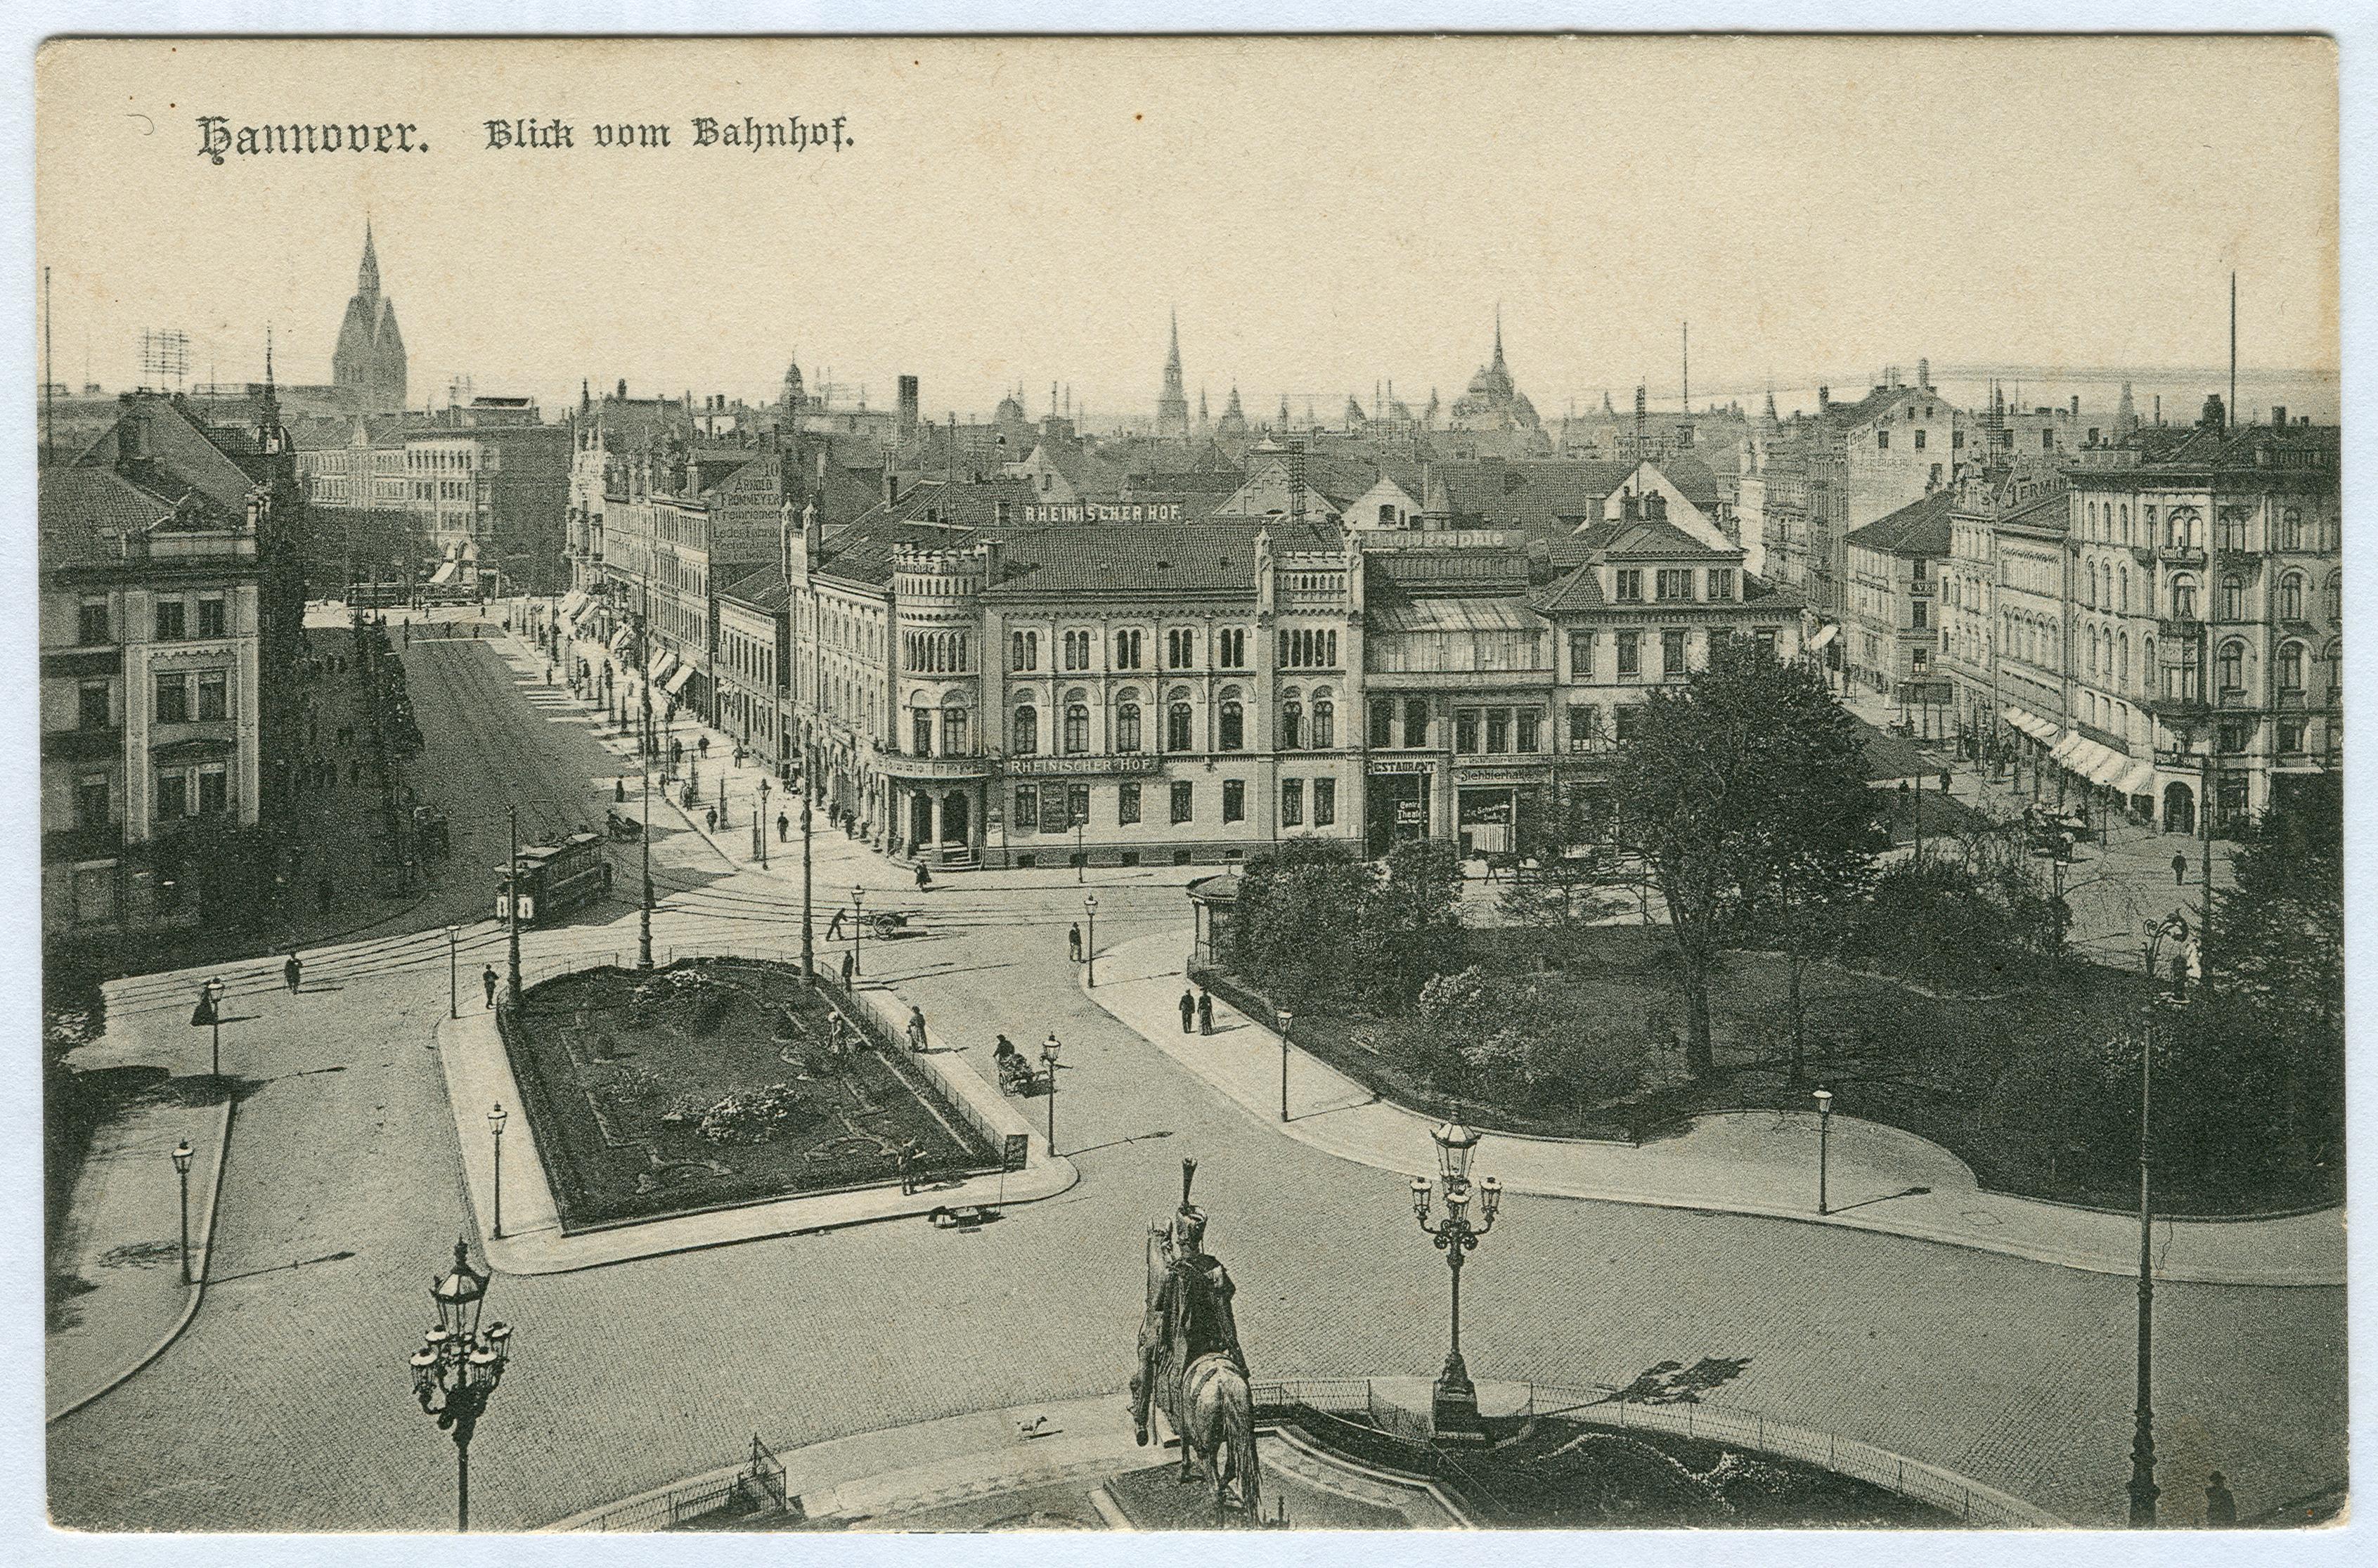 File:Karl F. Wunder PC 1009 Hannover. Blick vom Bahnhof.jpg